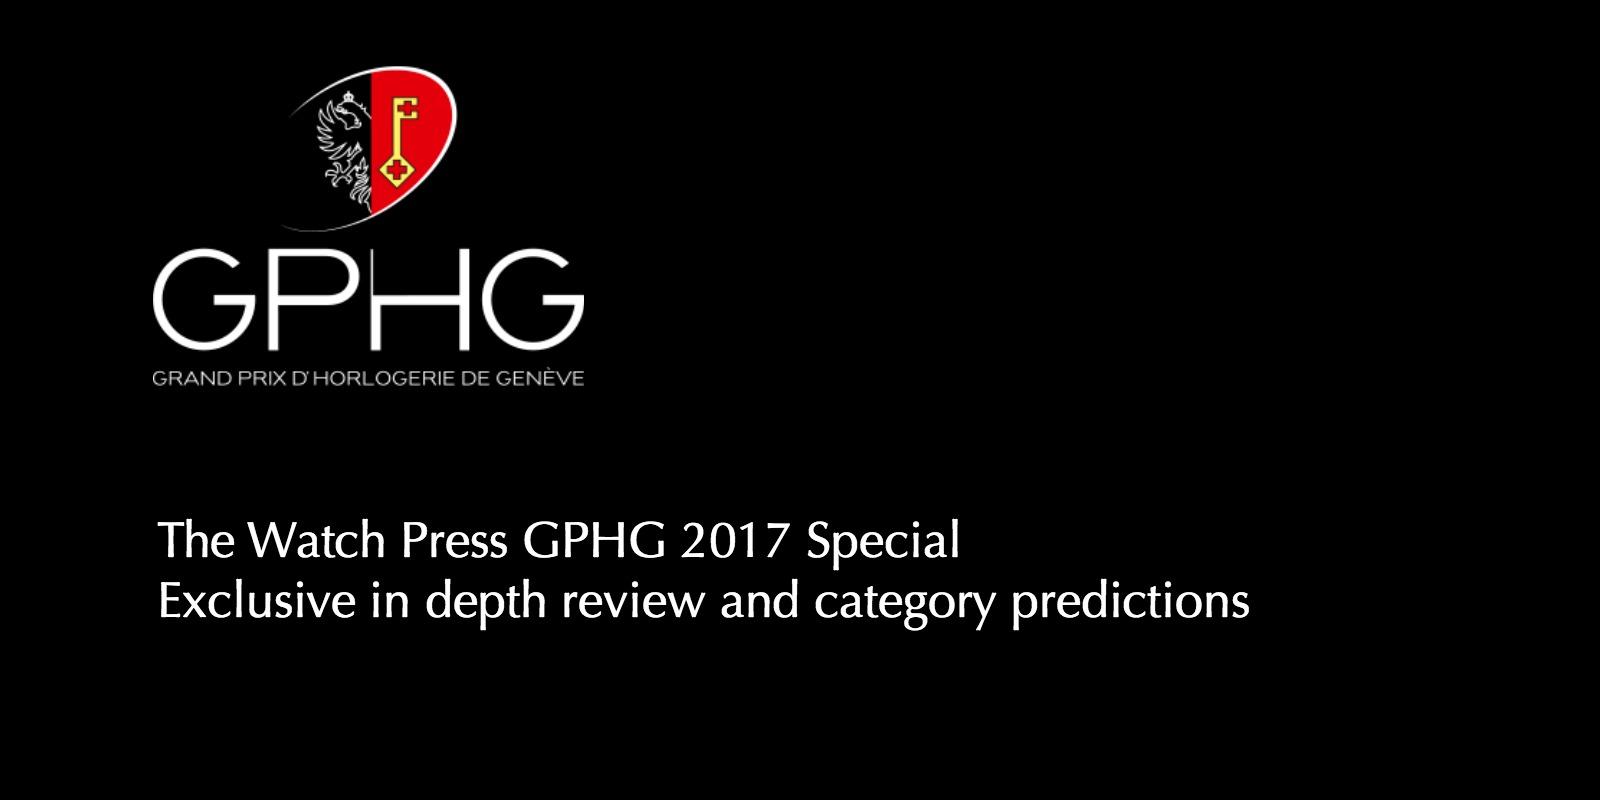 gphg-2017-banner-2.jpg